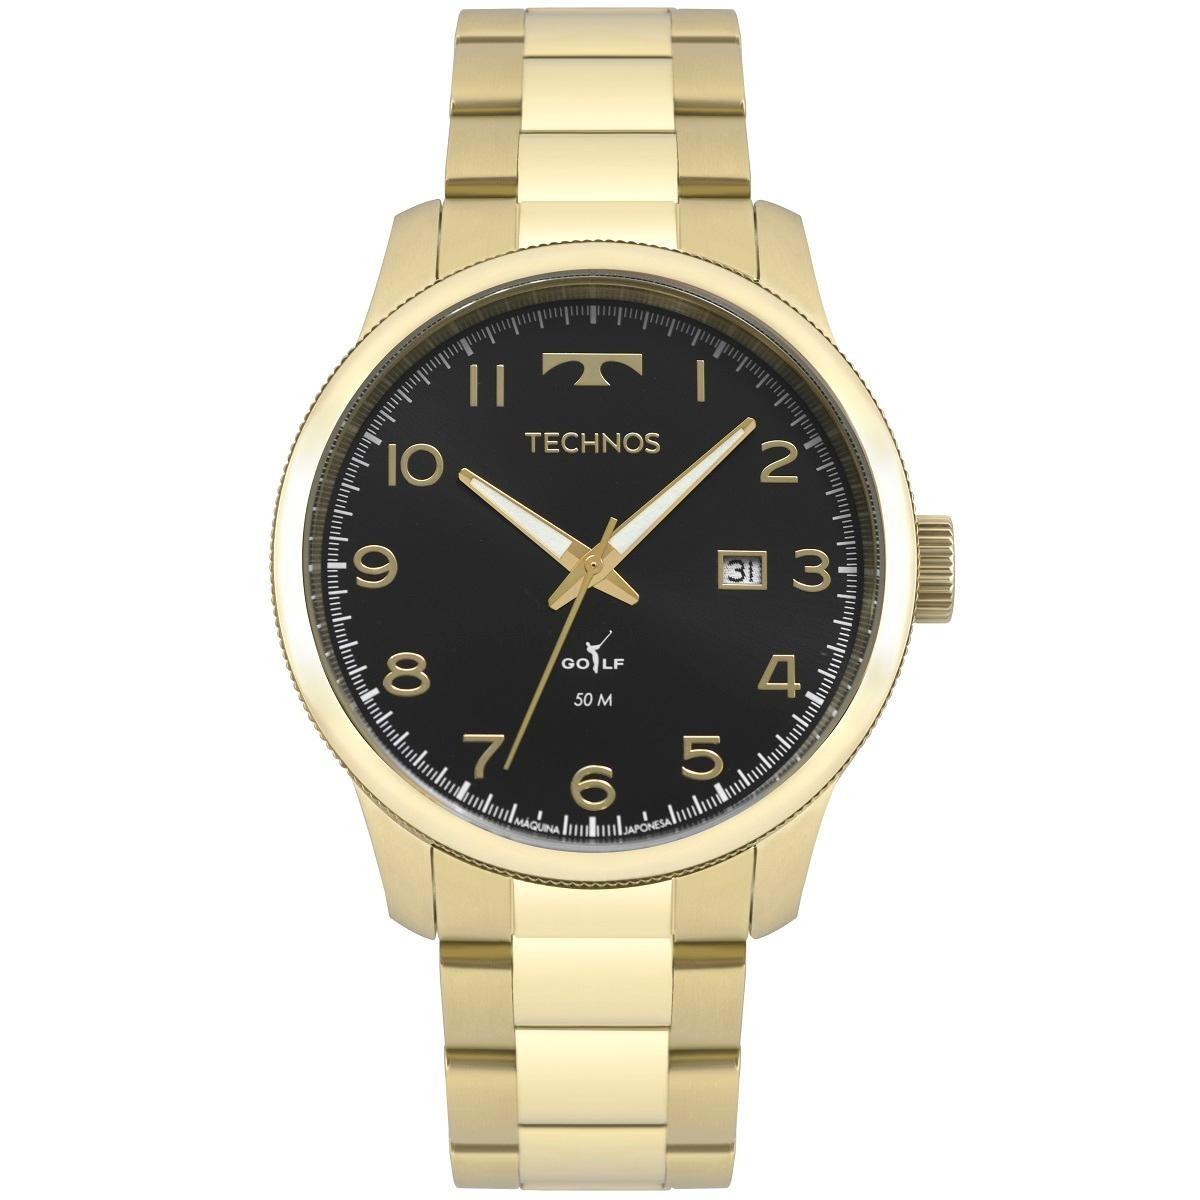 dfd09eaf4edd6 Relógio Masculino Technos Golf 2315laf 4p 44mm Aço Dourado - R  302 ...